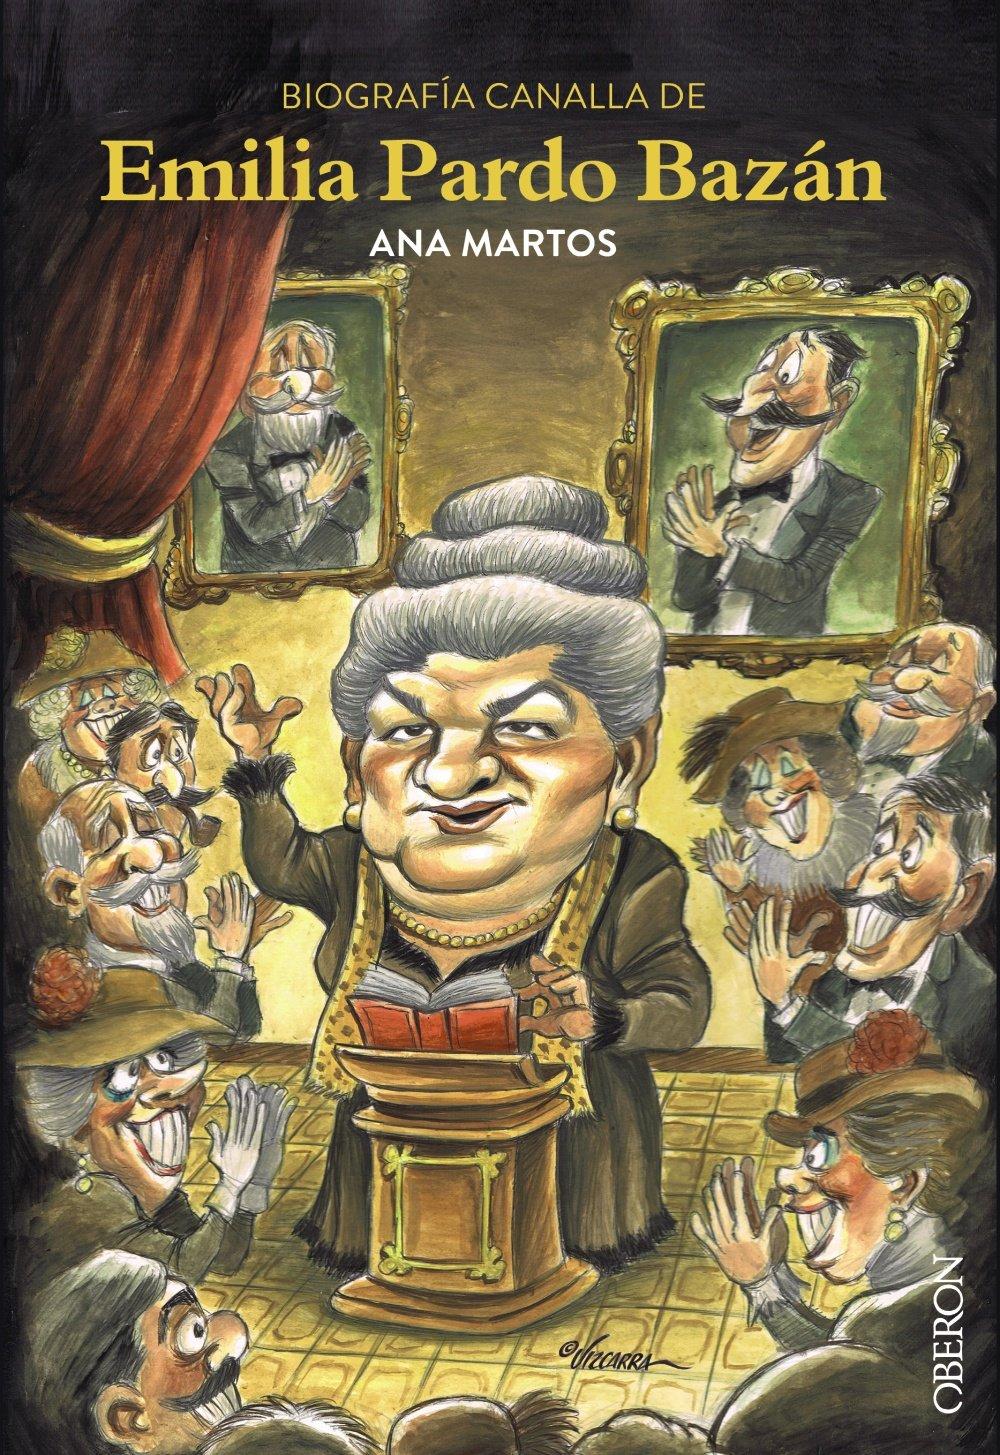 Biografía Canalla De Emilia Pardo Bazán Libros Singulares Amazon Es Martos Rubio Ana Libros